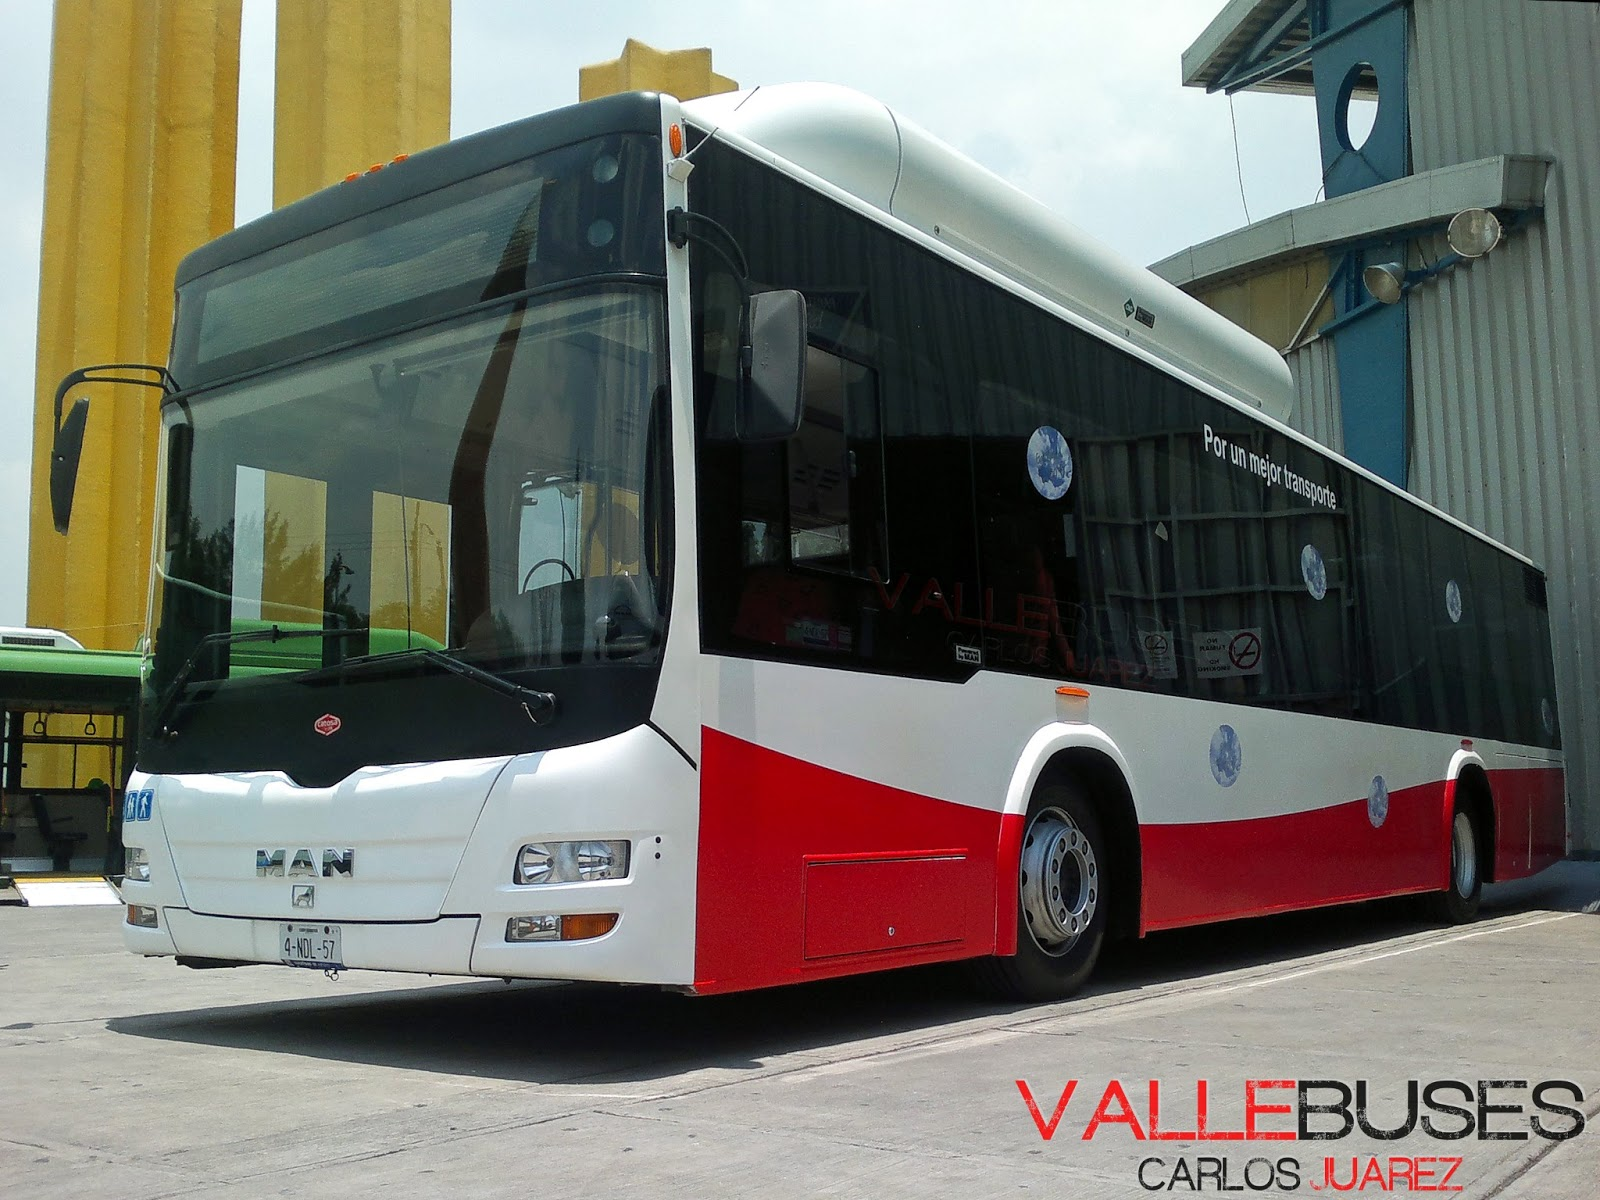 autobus cuarte - 28 images - nuevo modelo de autob 250 s adquirido ...